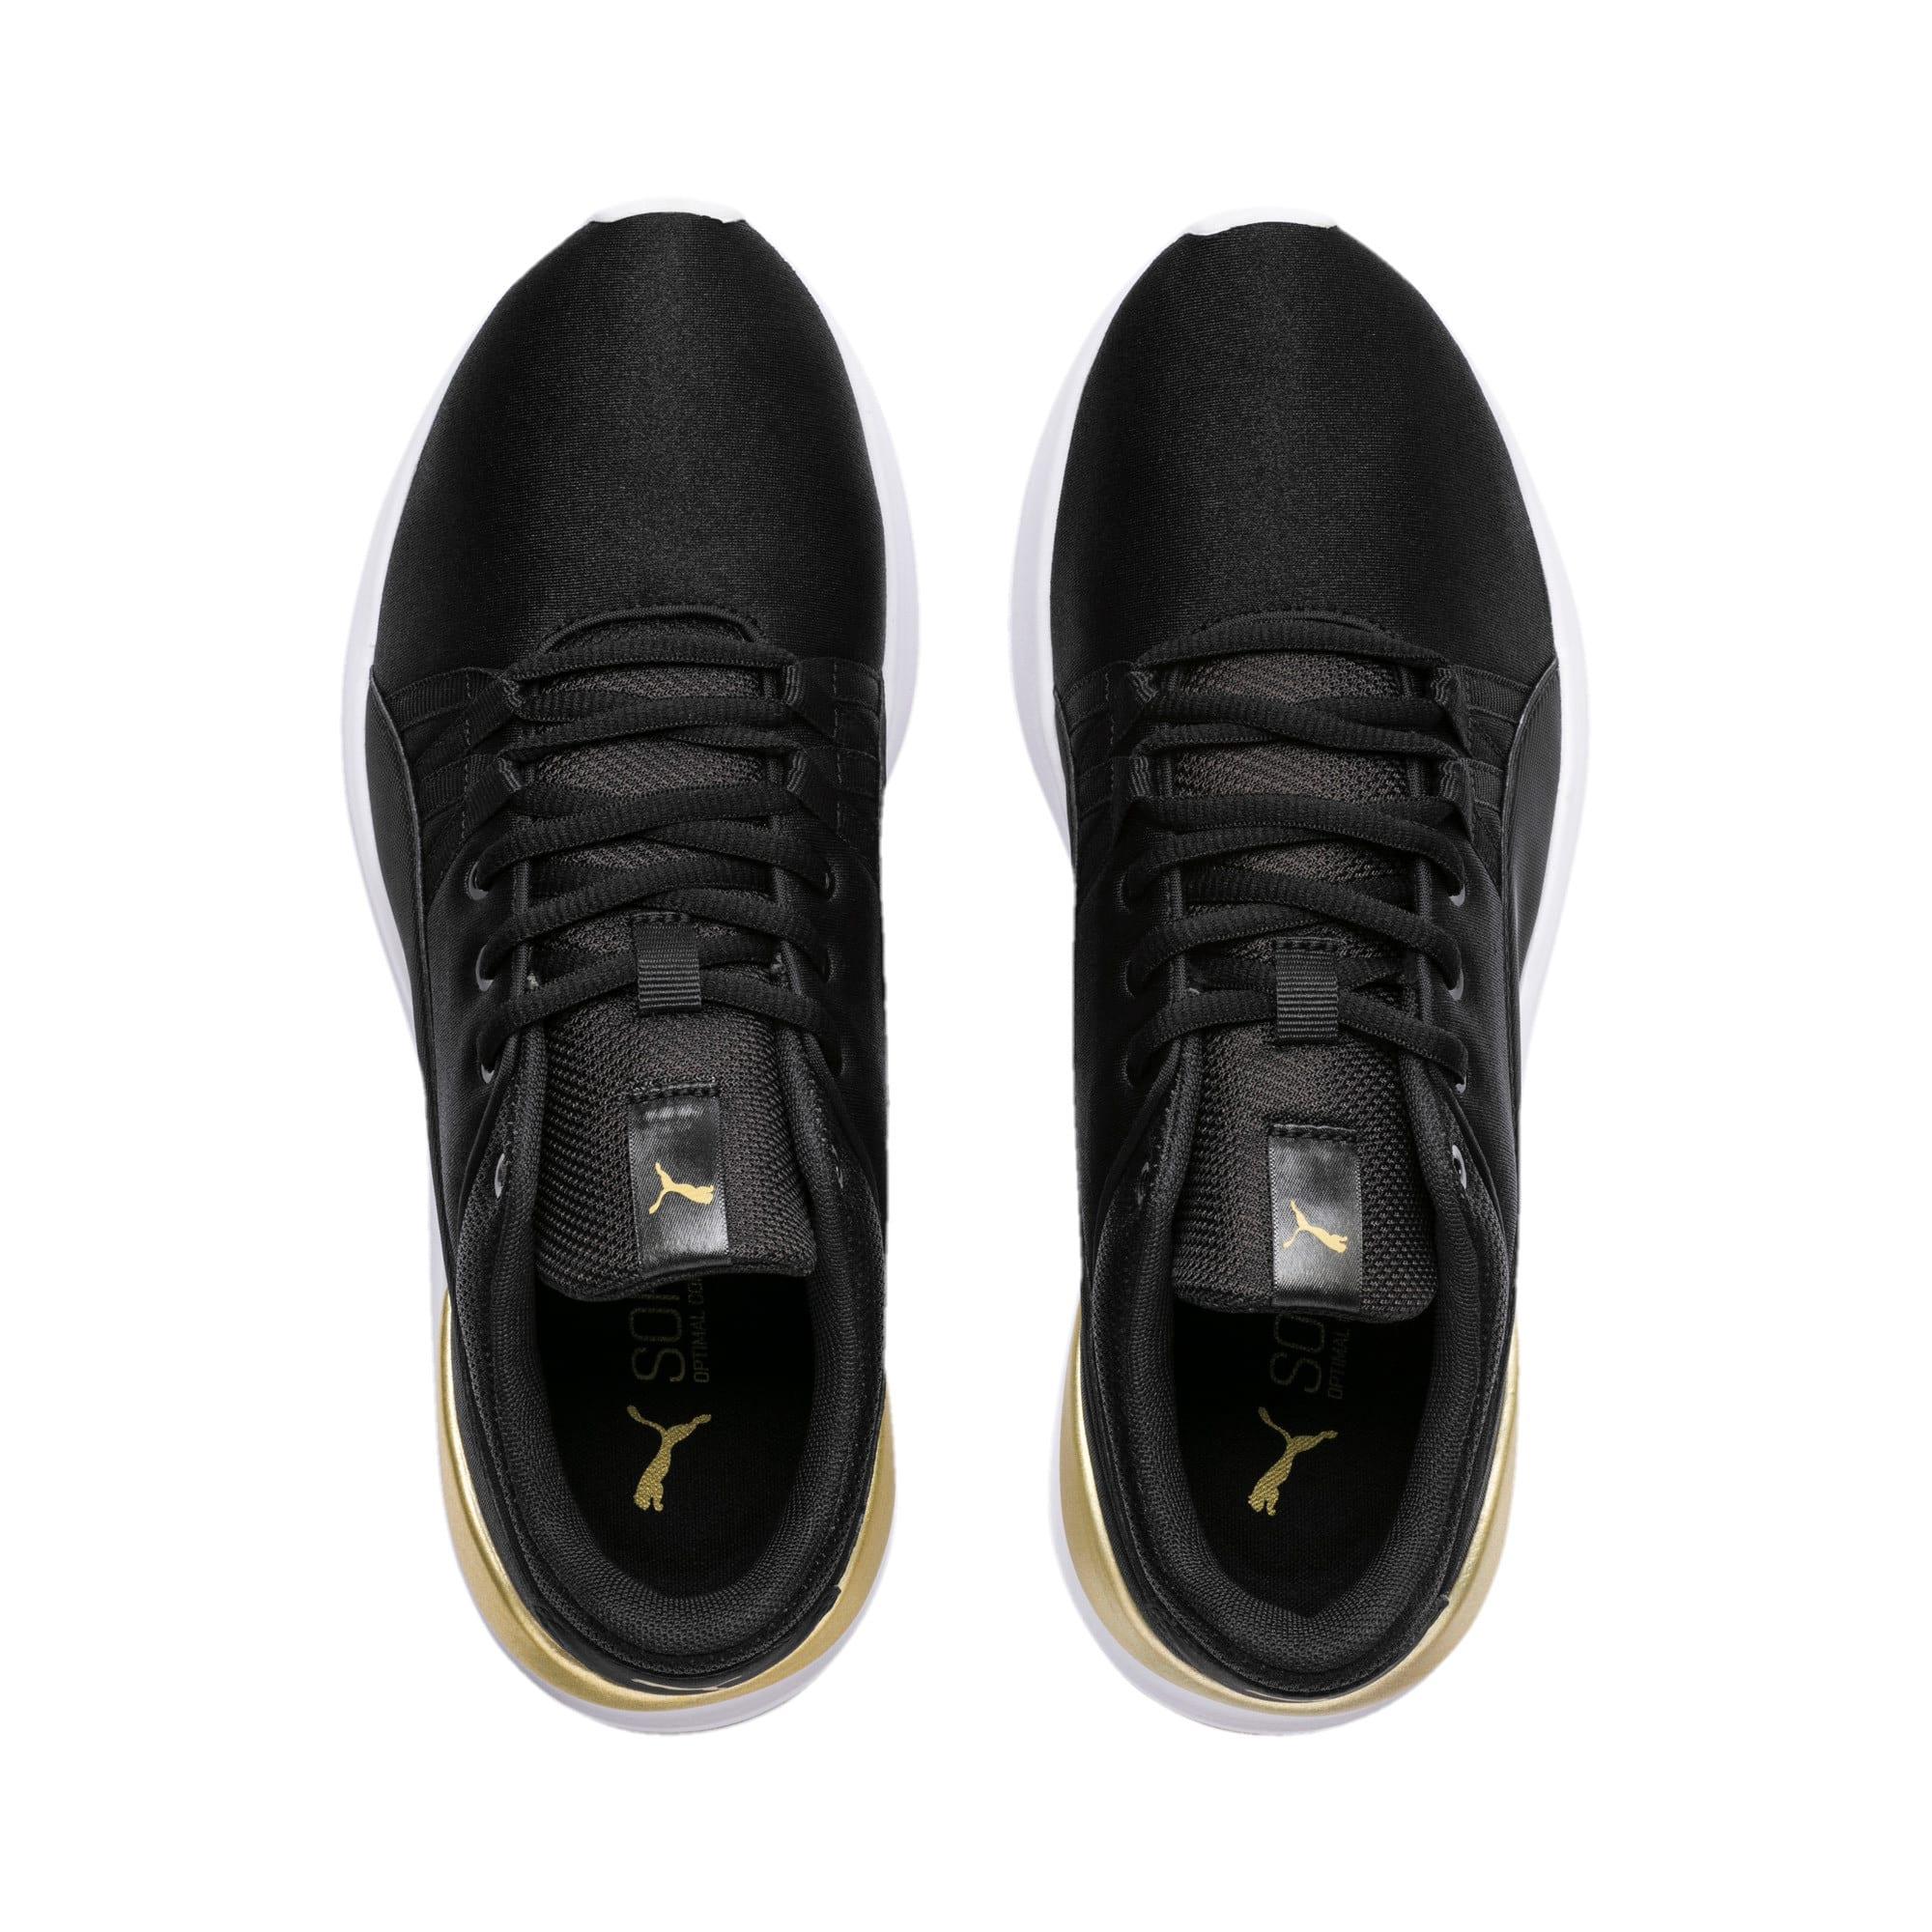 Thumbnail 4 of Adela Satin Women's Sneakers, Puma Black - Puma Black, medium-IND